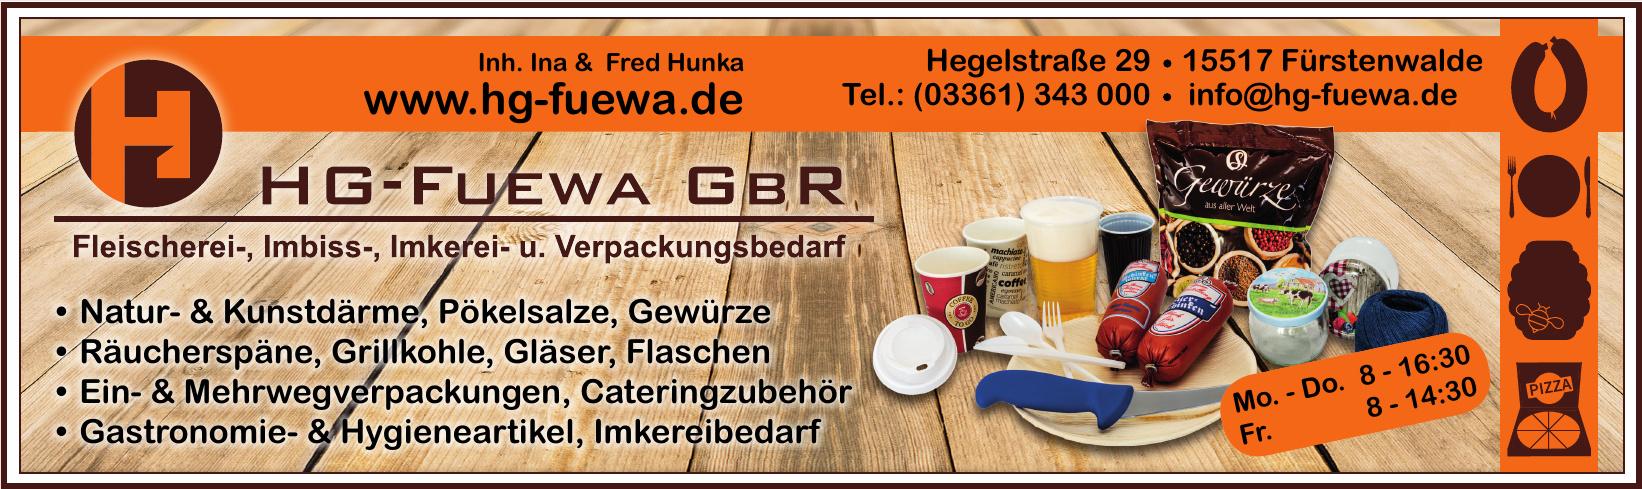 HG-Fuewa GbR